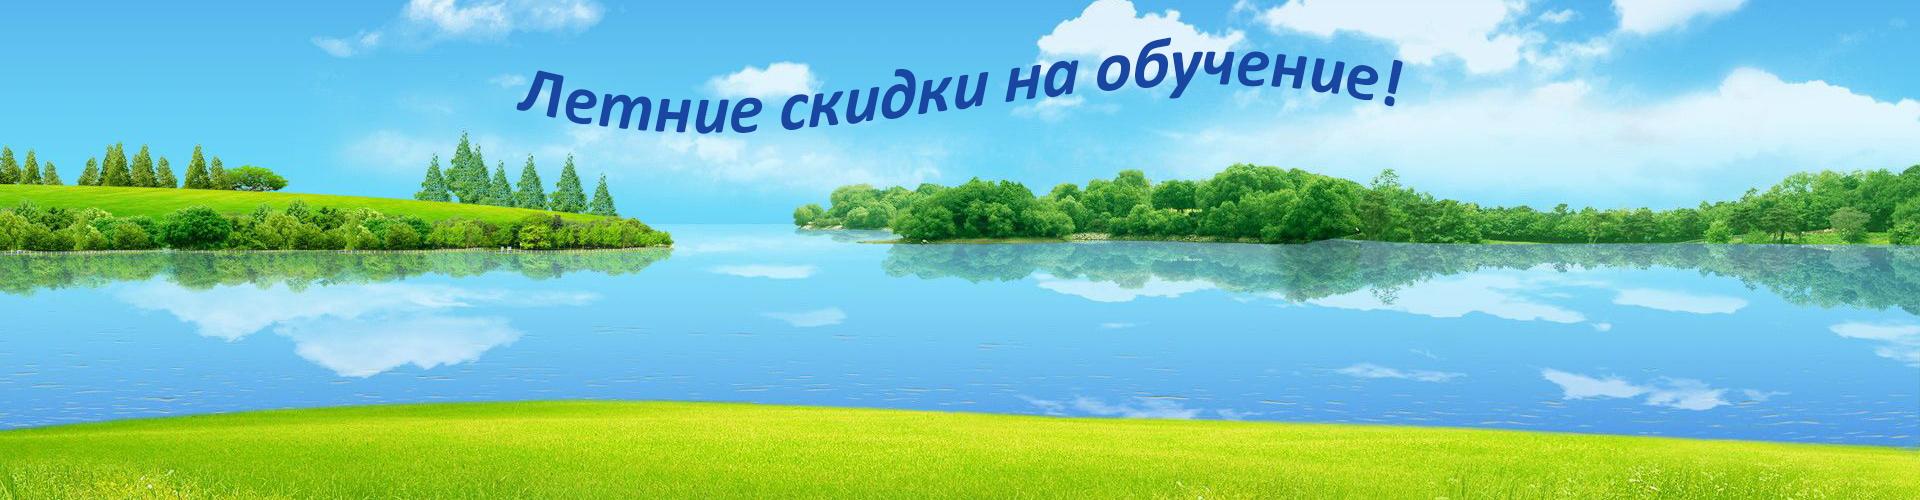 letnie-skidki3